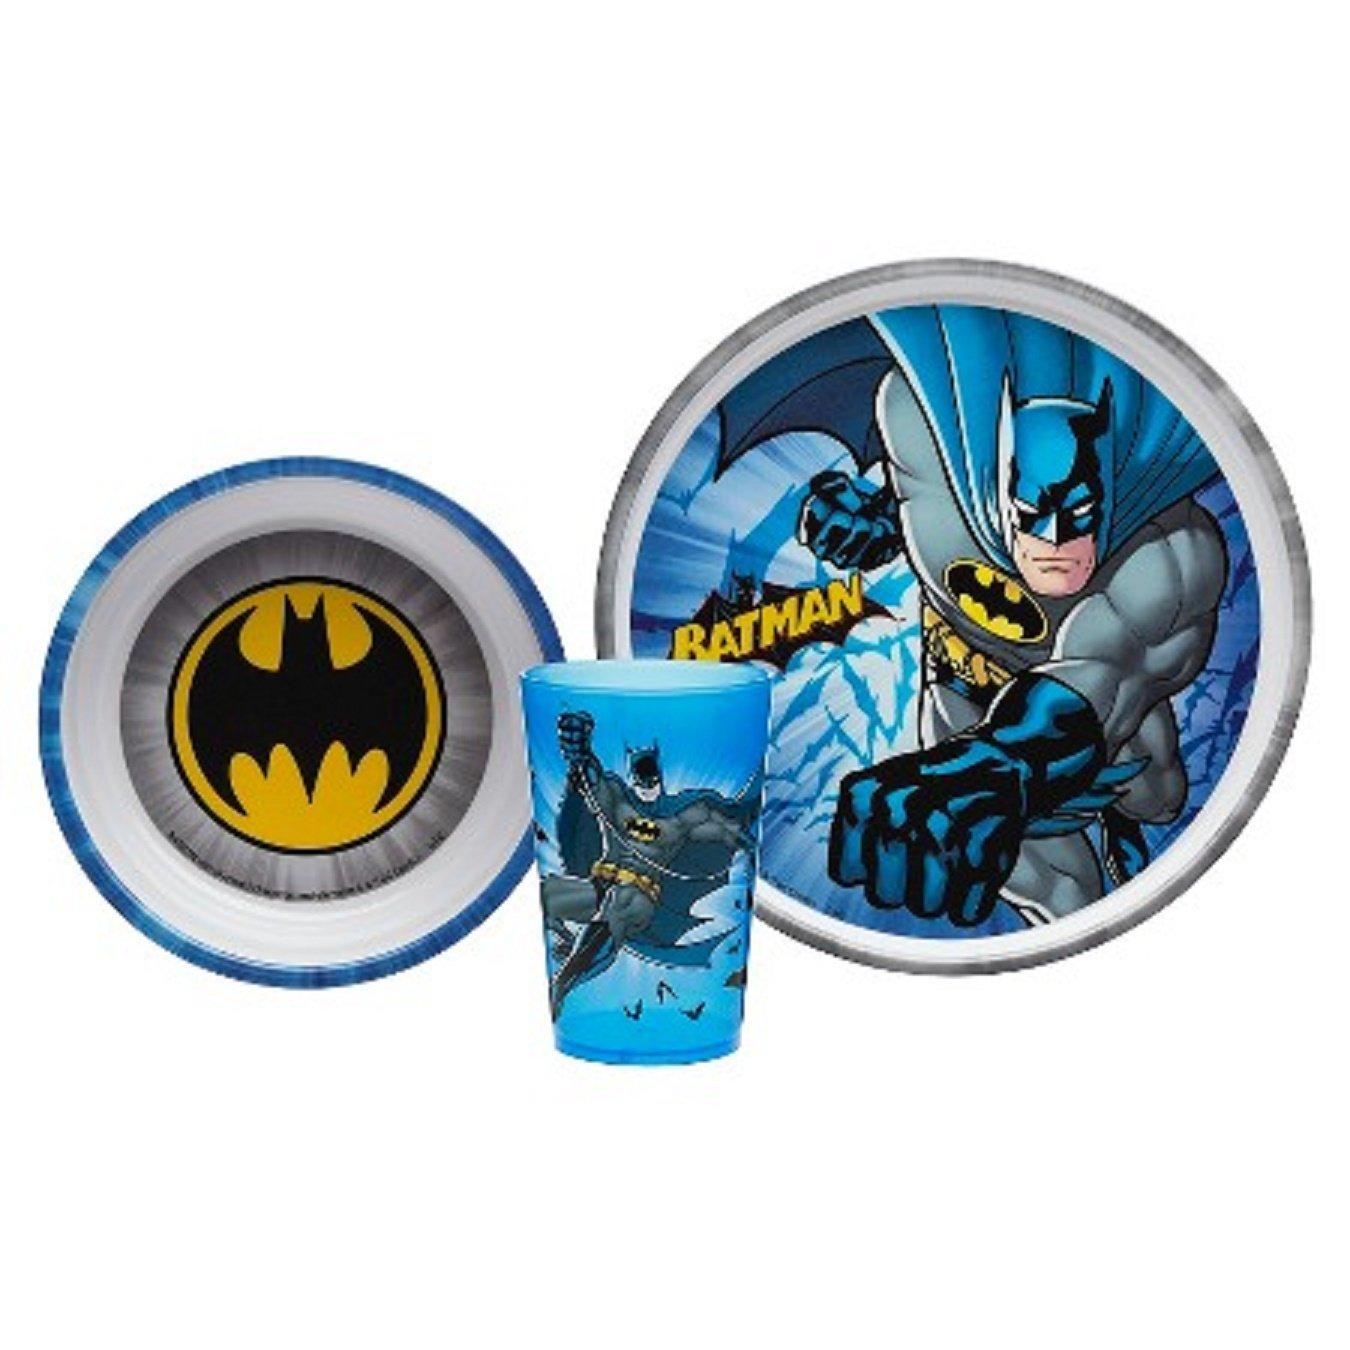 Designs Batman 3-piece Mealtime Set includes Plate Bowl and Tumbler BPA-free by Zak Designs Kitchen \u0026 Dining  sc 1 st  Amazon.com & Amazon.com: Zak! Designs Batman 3-piece Mealtime Set includes Plate ...